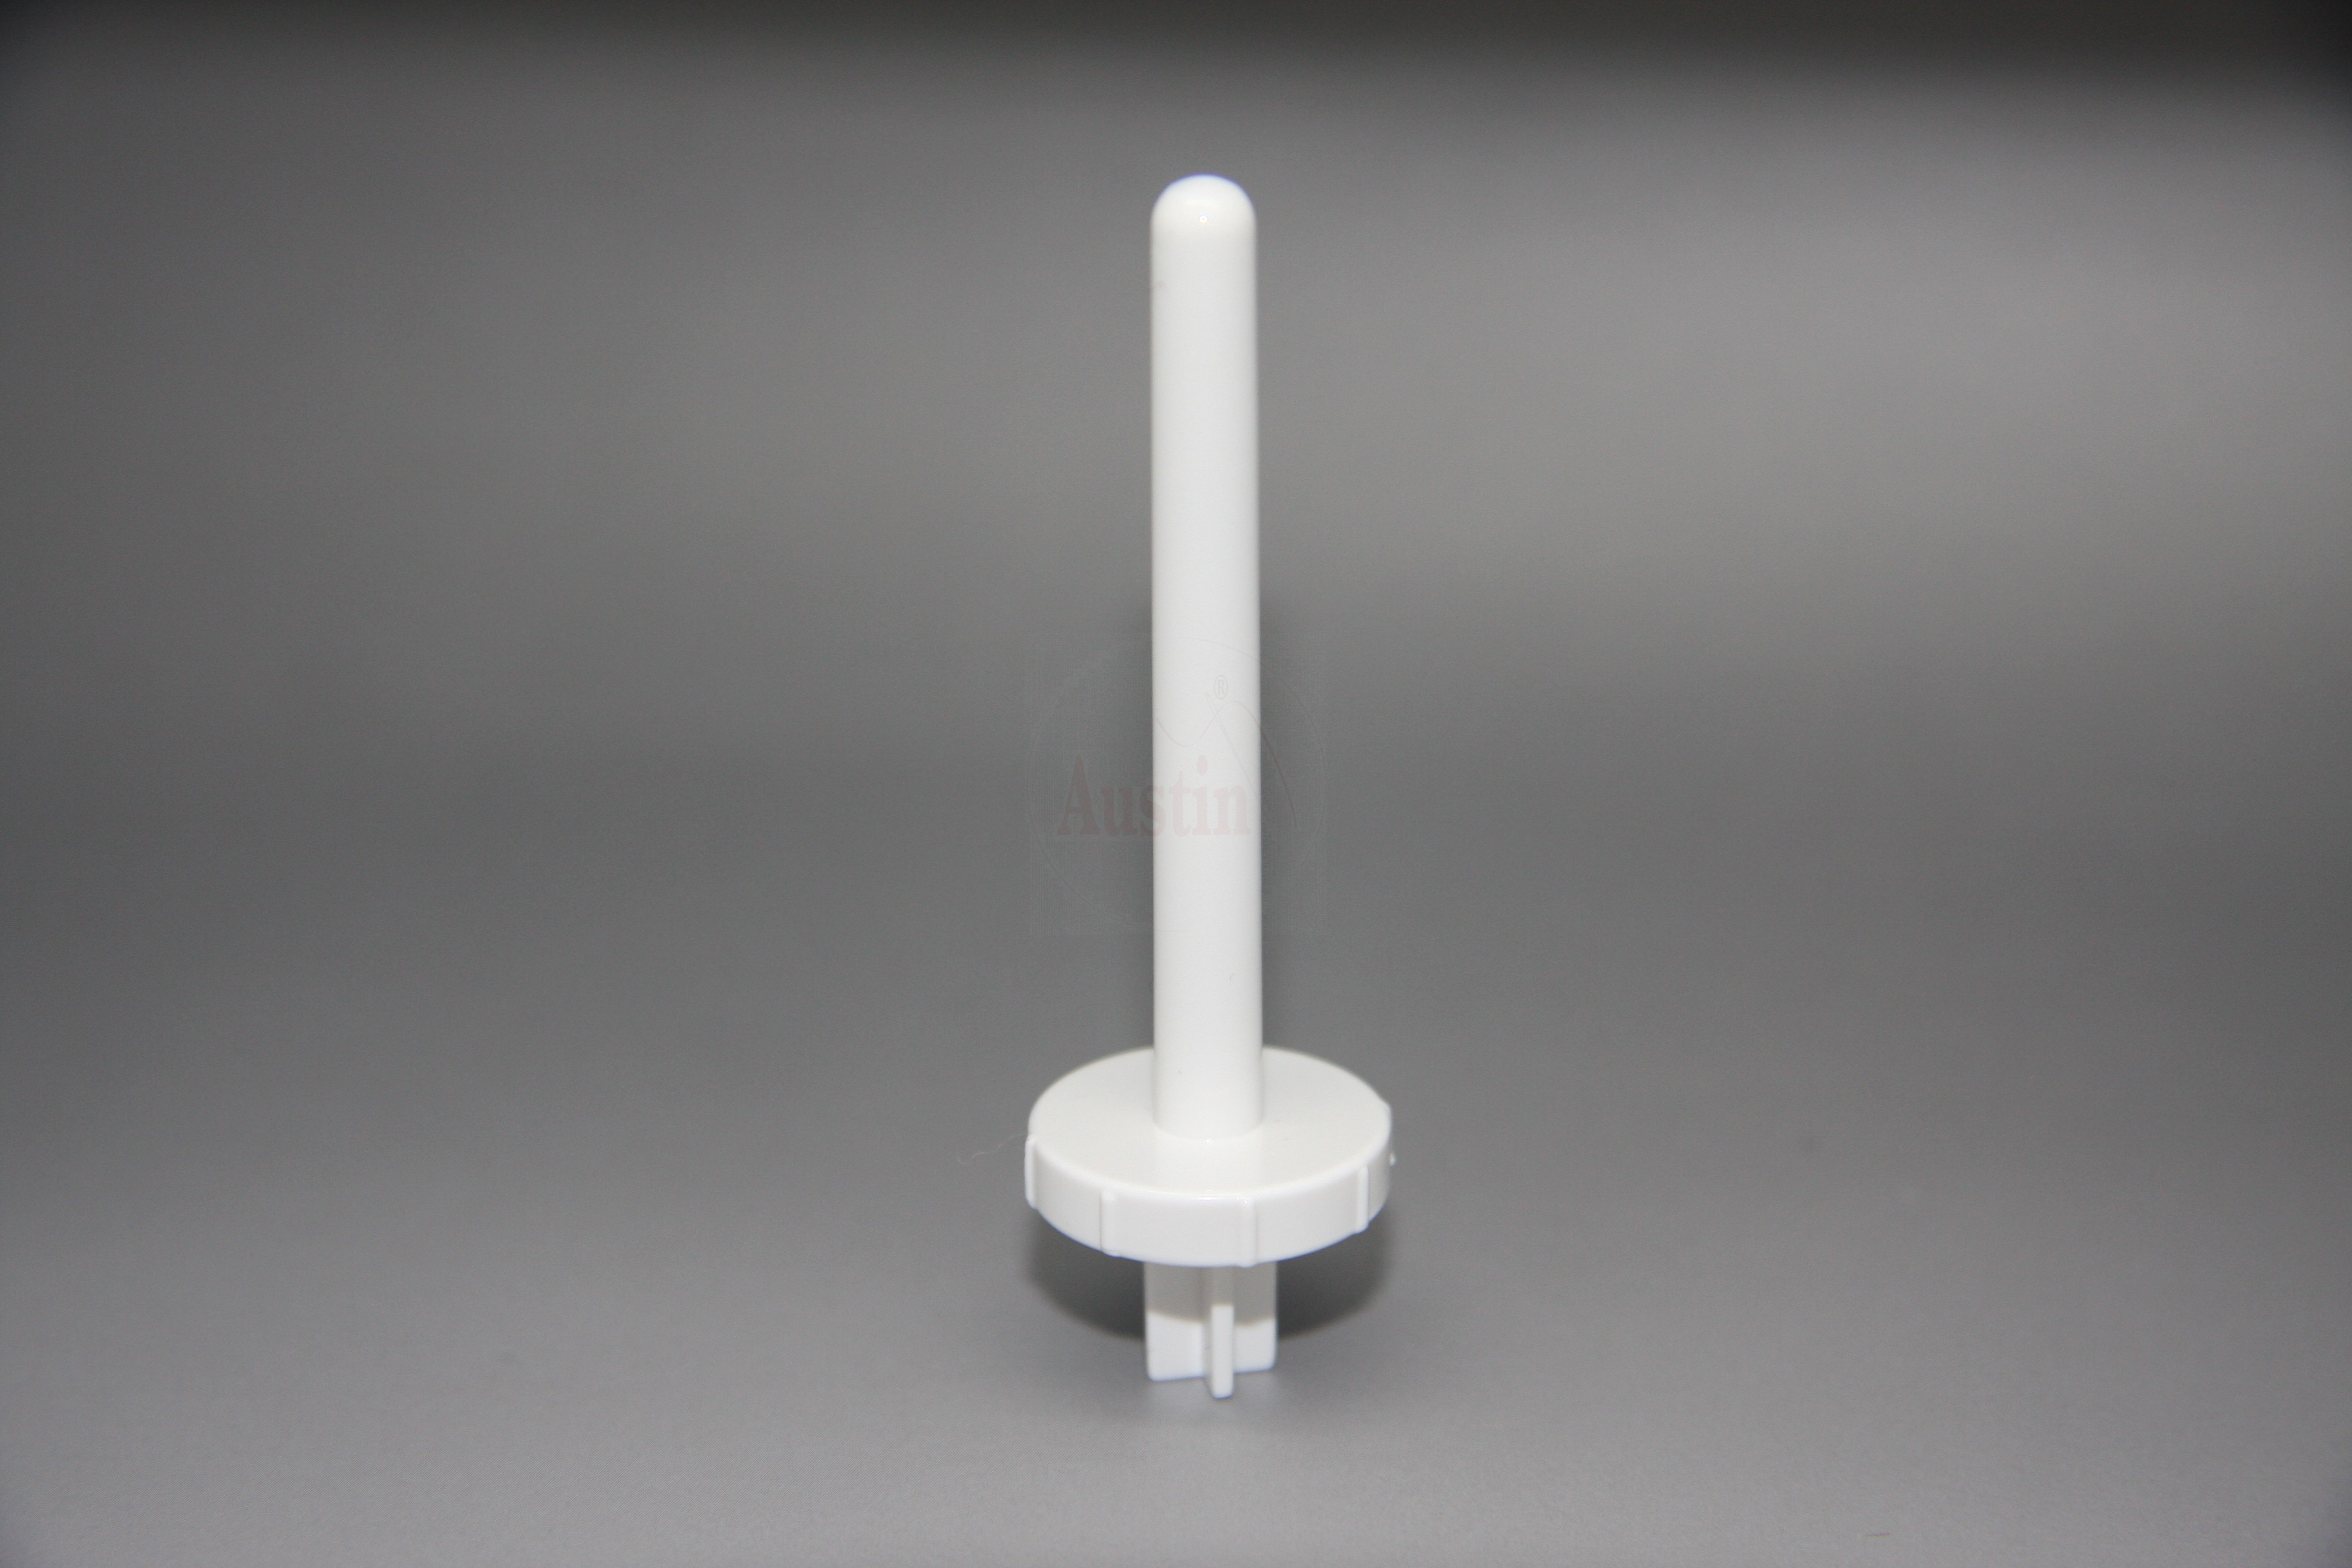 Janome Compatible Twin Needle Spool Pin (Spare)